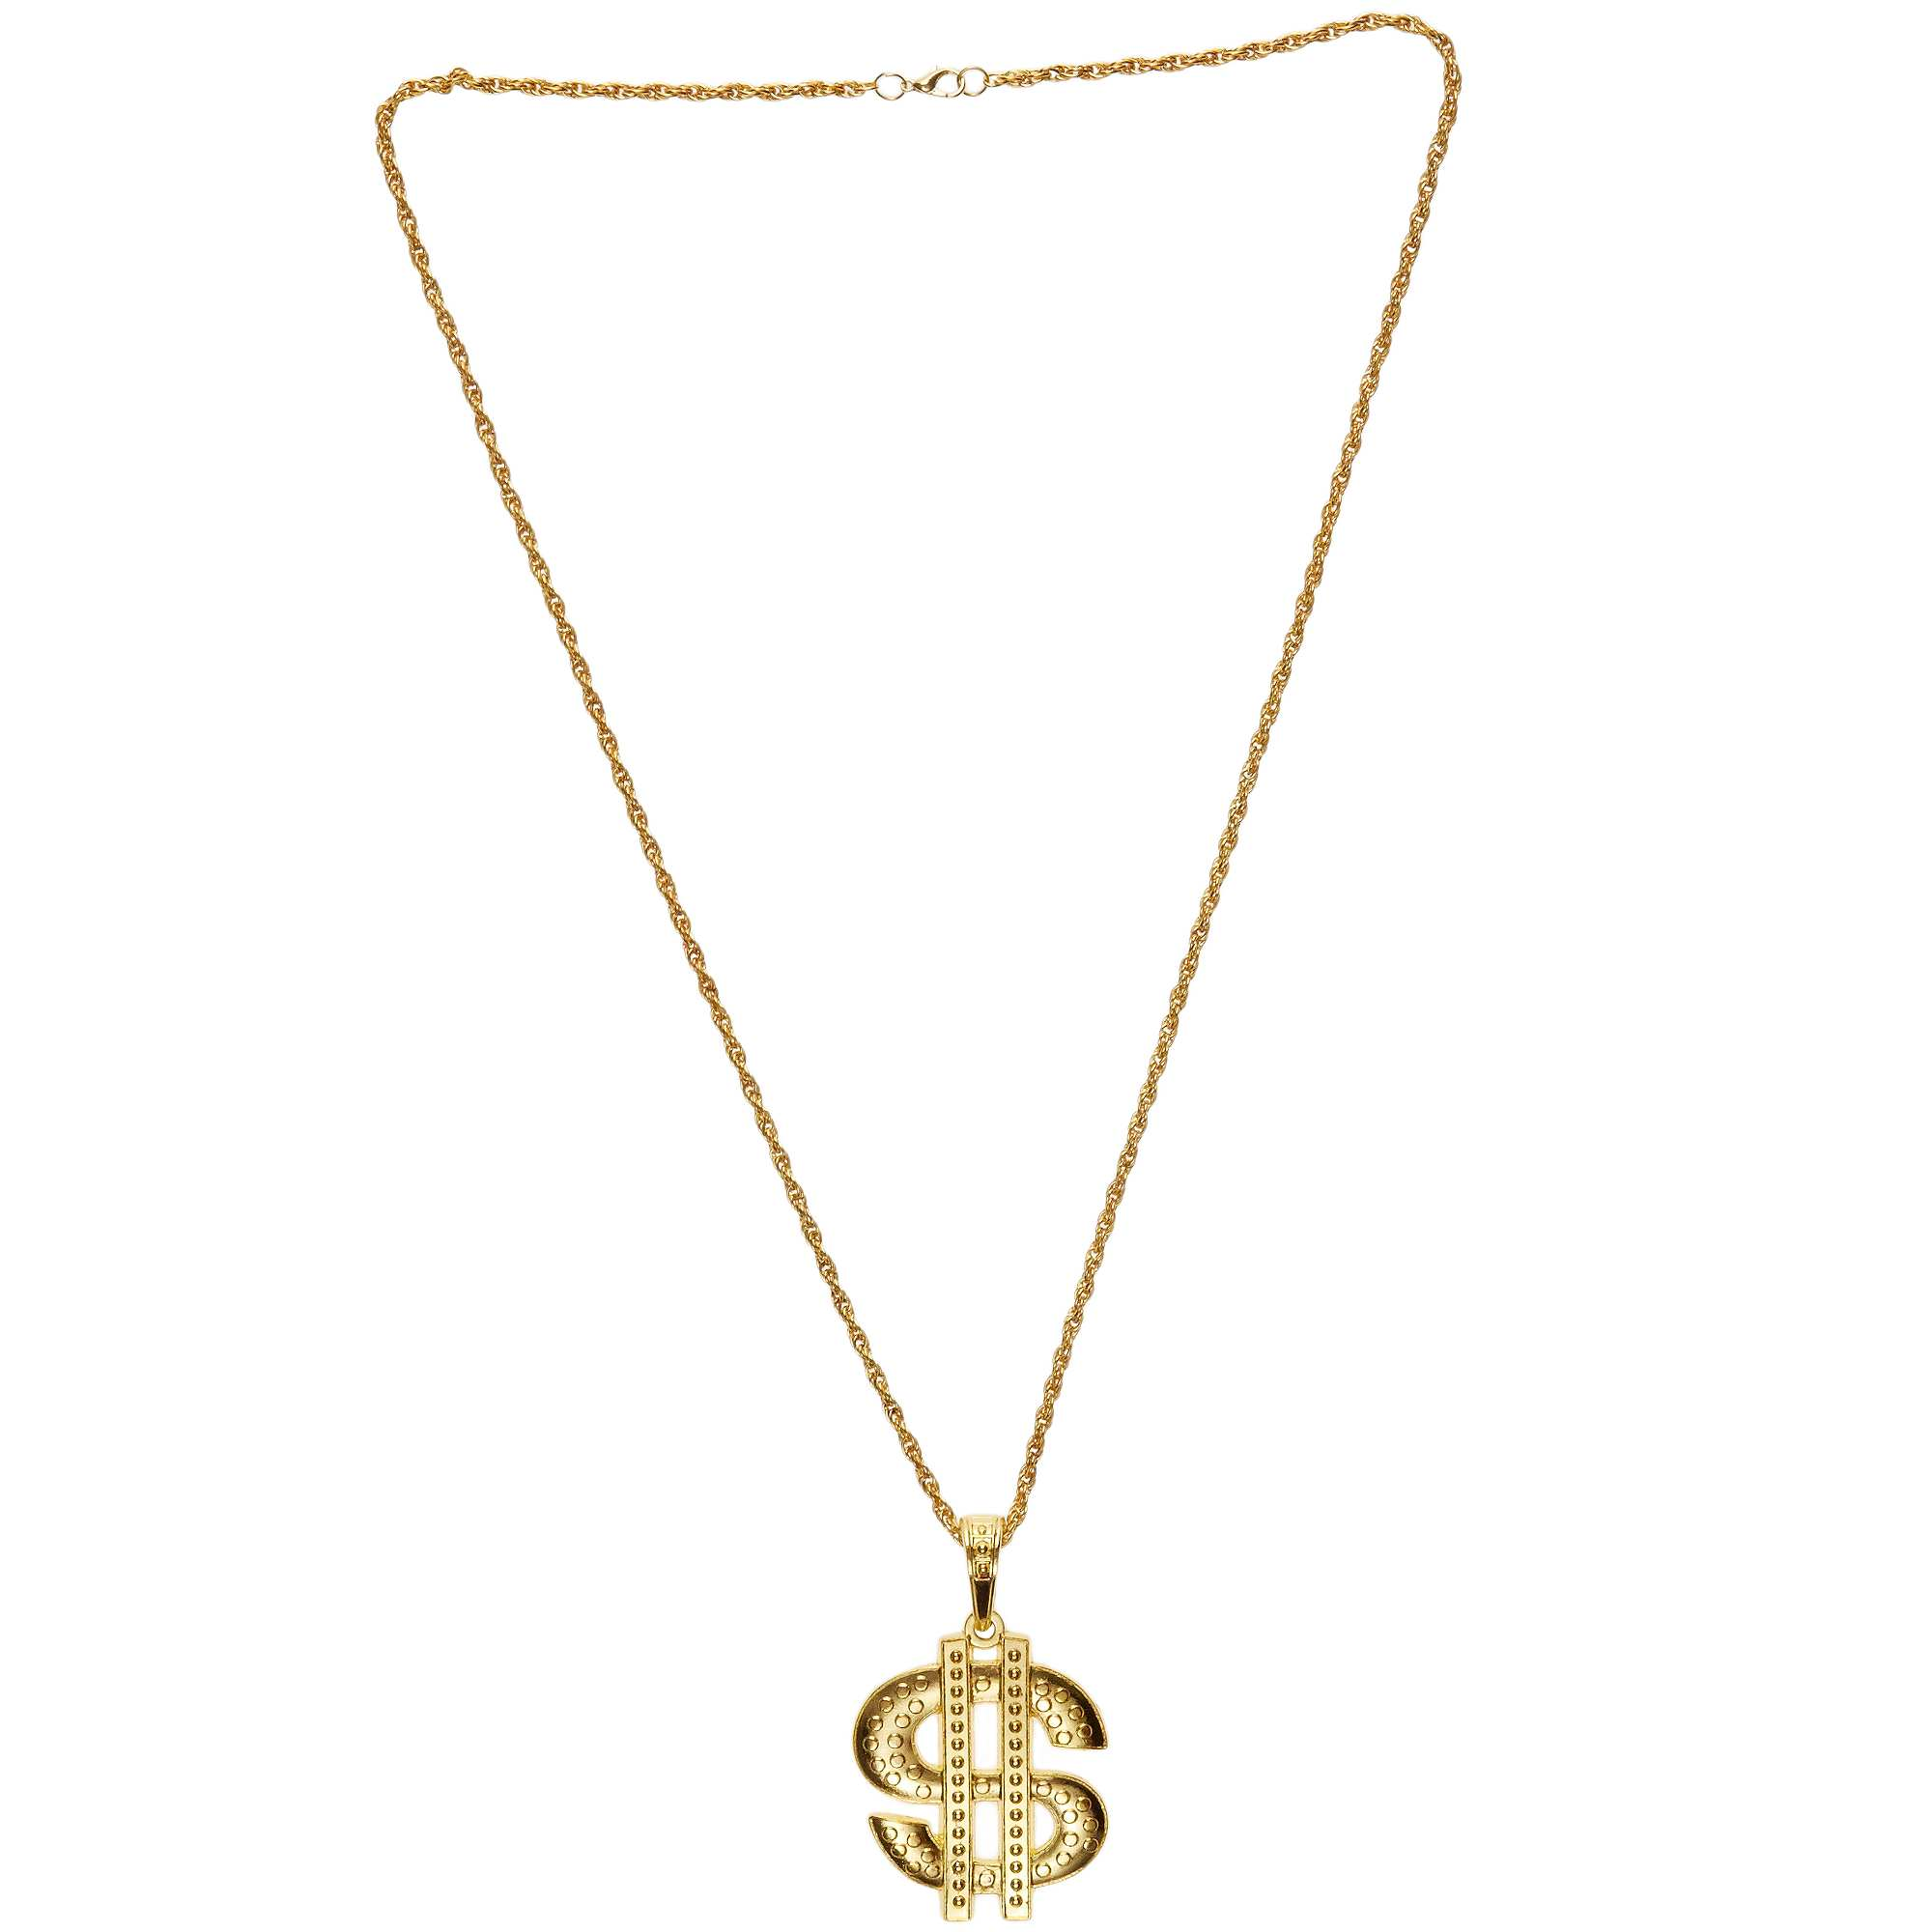 6c057d5e86cbb Collar metálico  Dollar  dorado Accesorios. Loading zoom. Haz clic en la  imagen para agrandar. zoom